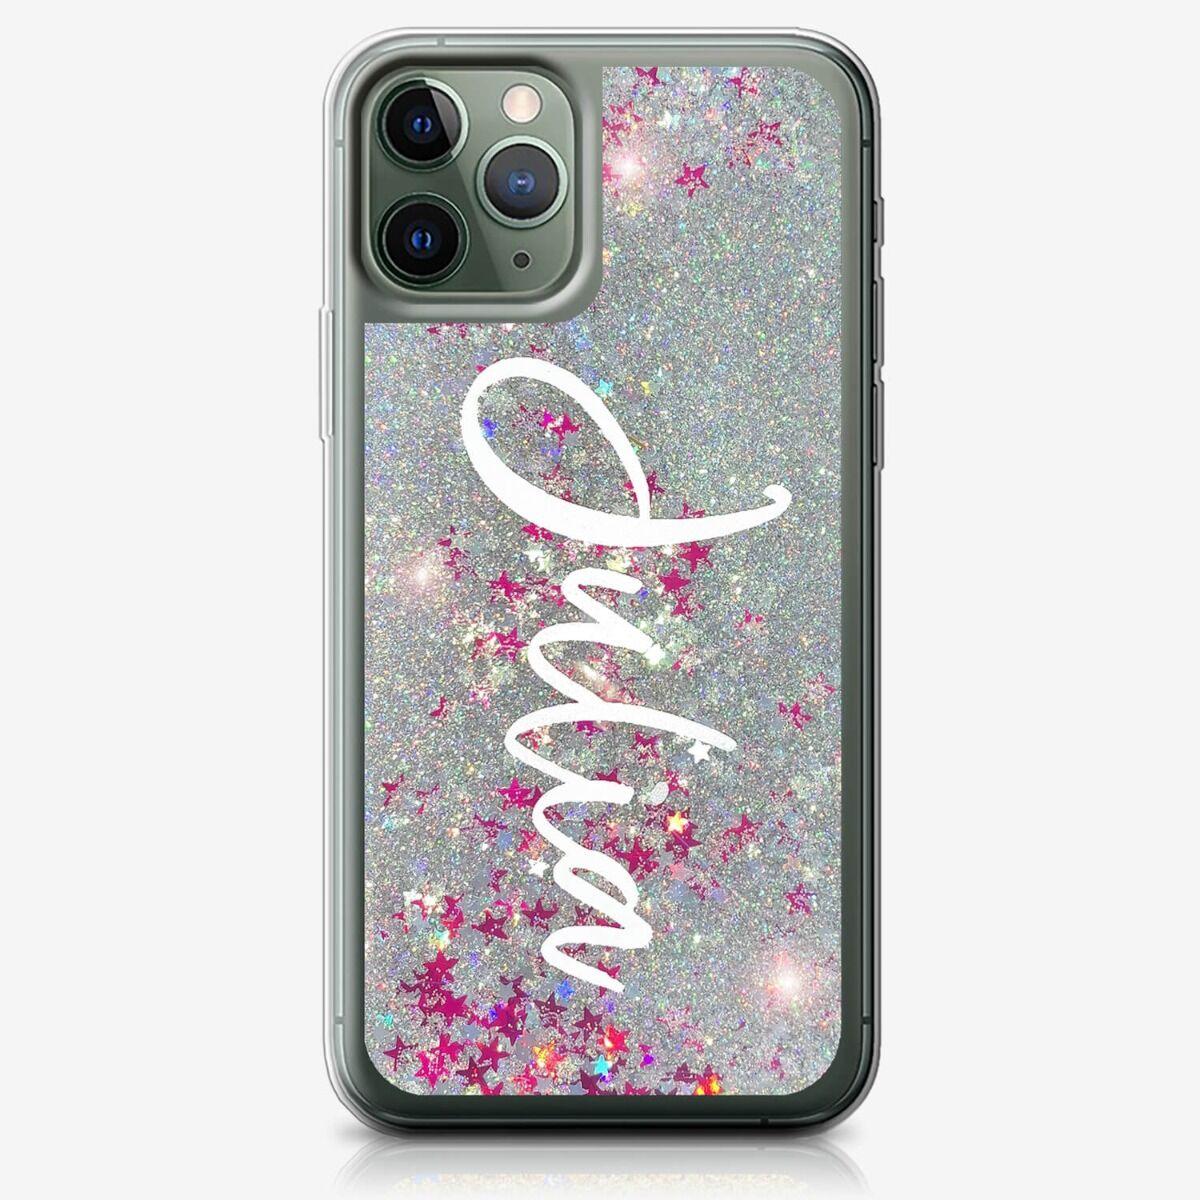 iPhone 11 Pro Max Glitter Case 16258